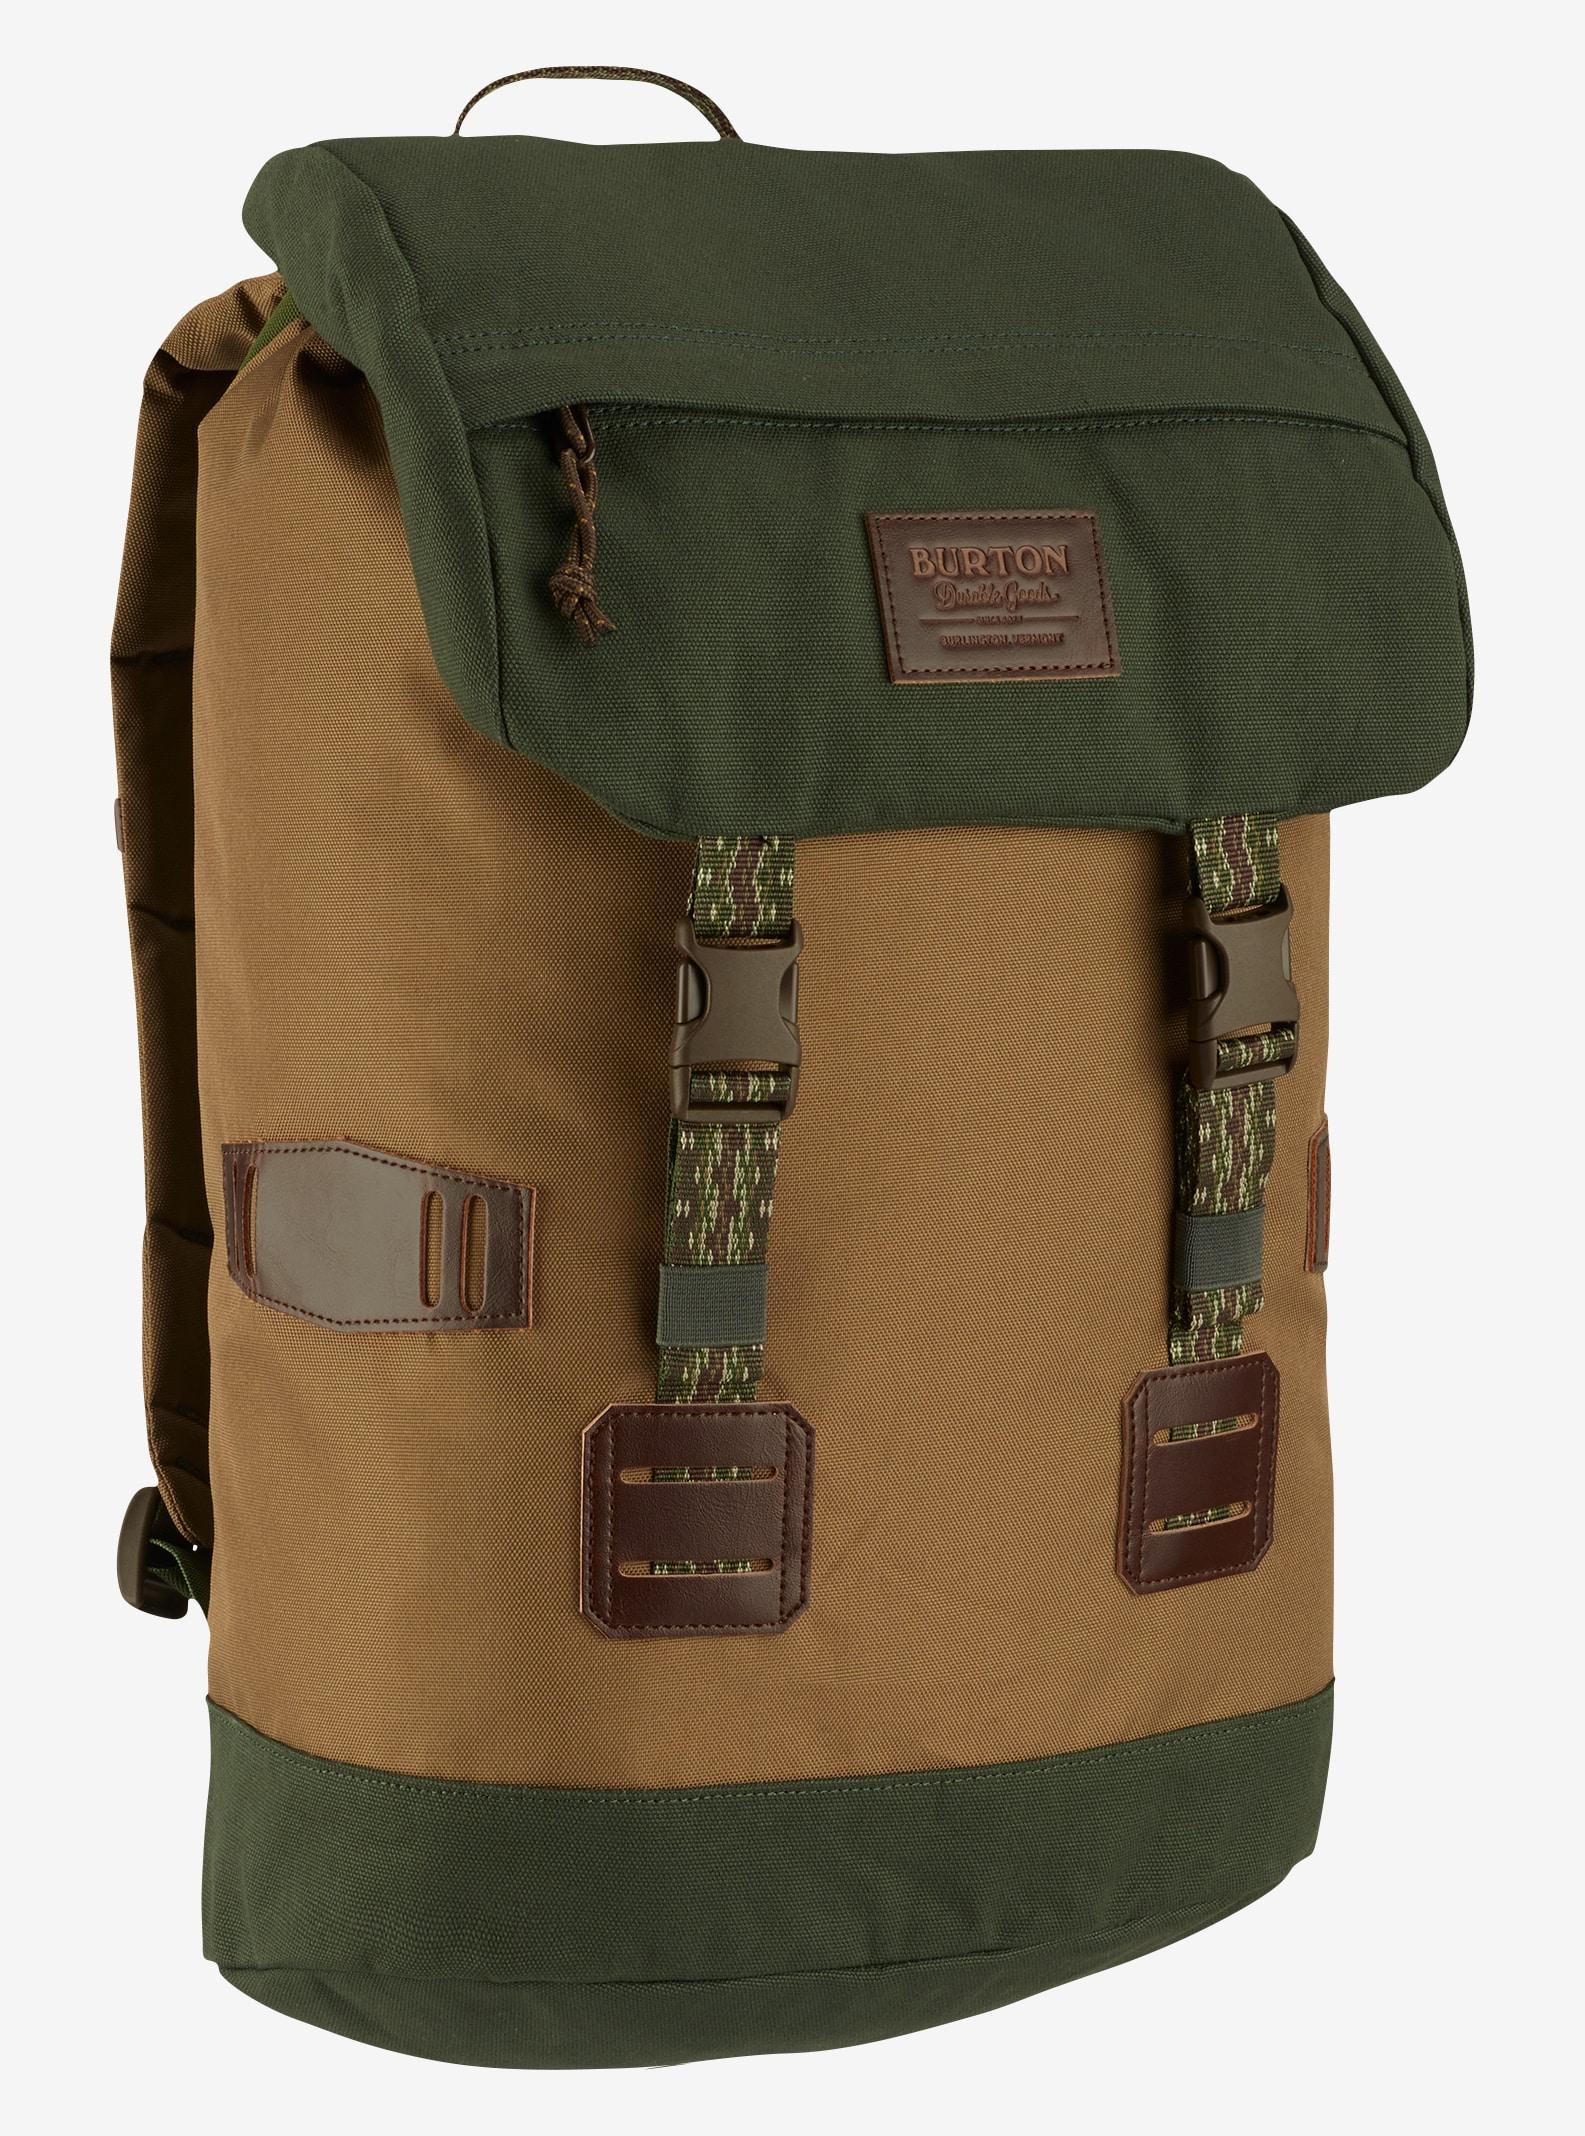 Burton Tinder Backpack shown in Kelp Coated